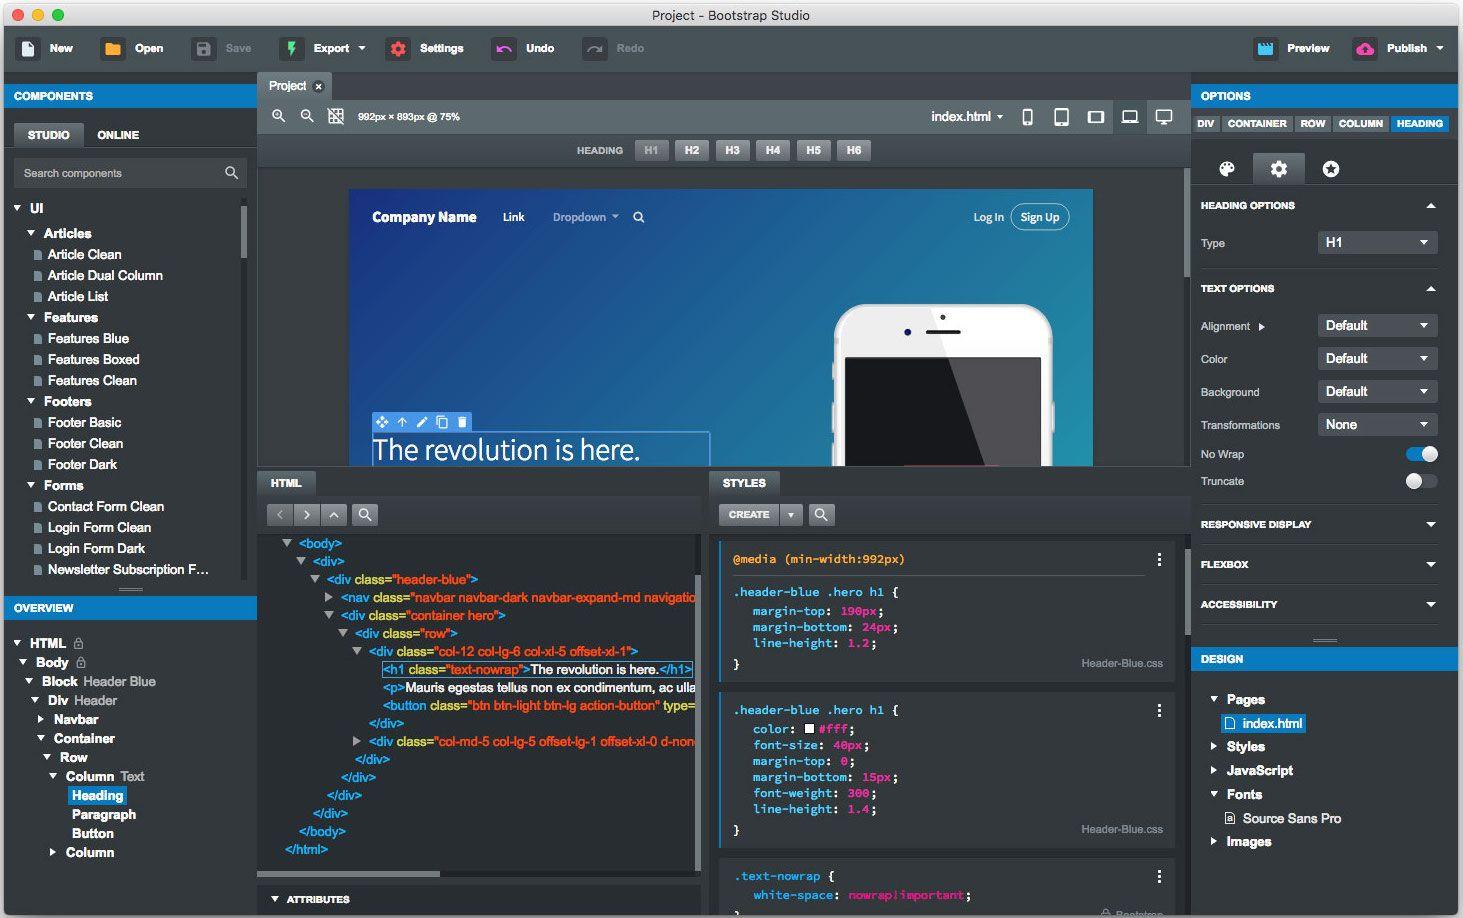 bootstrap studio free download for windows 10 | Bootstrap Studio